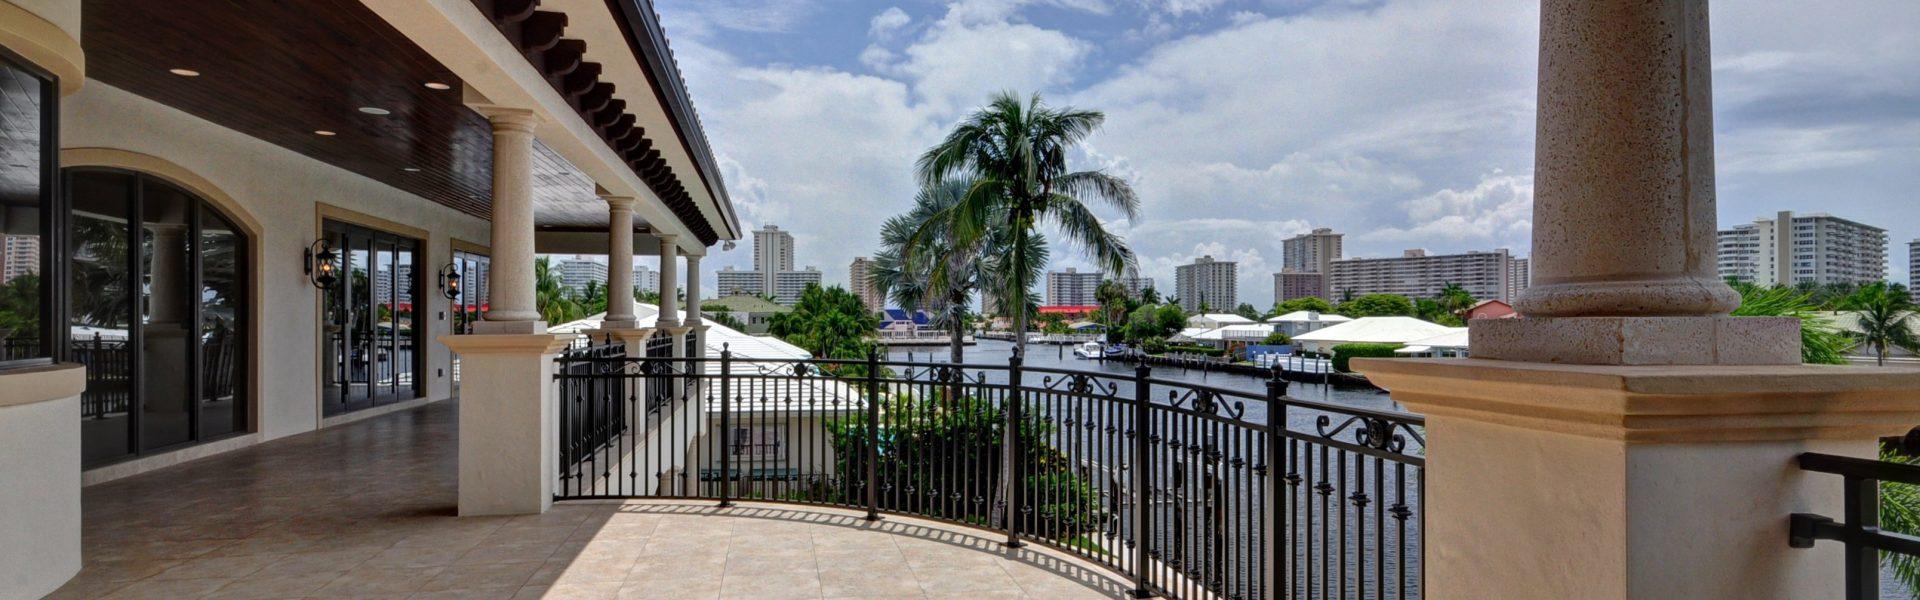 2800 NE 38th Street MLS HID725338 Room Balcony